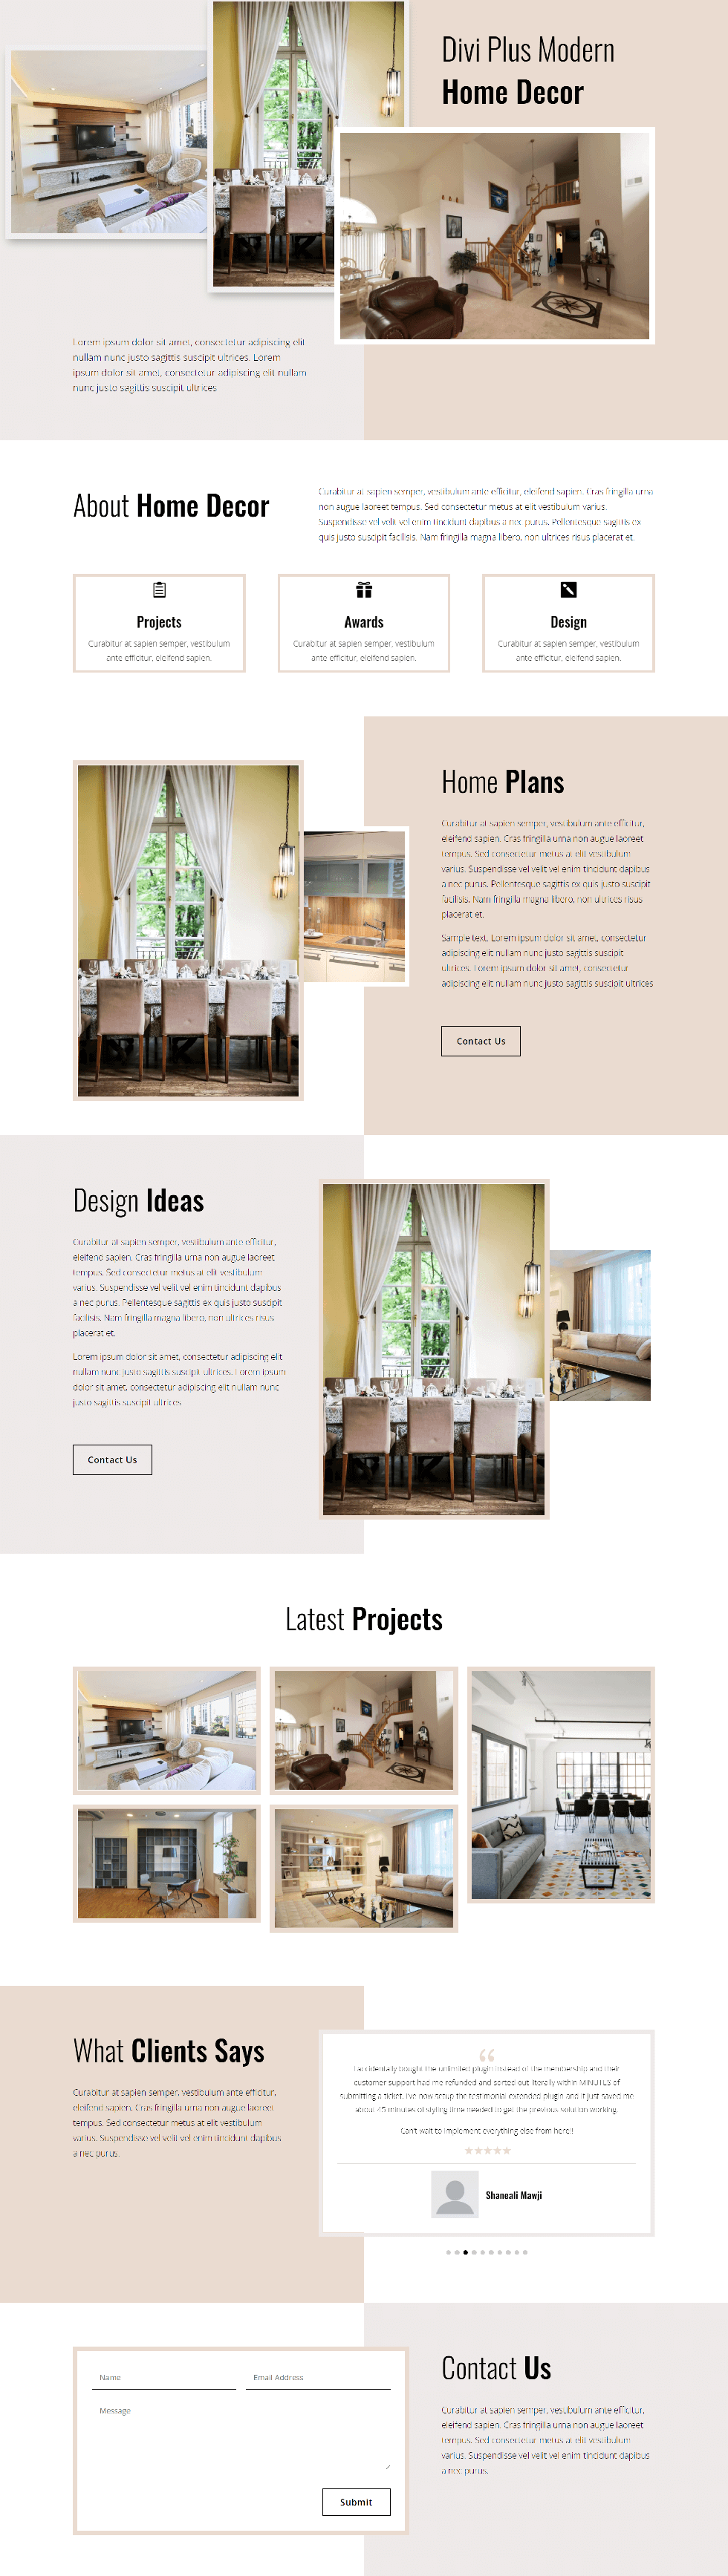 Divi Plus Home Decor Image